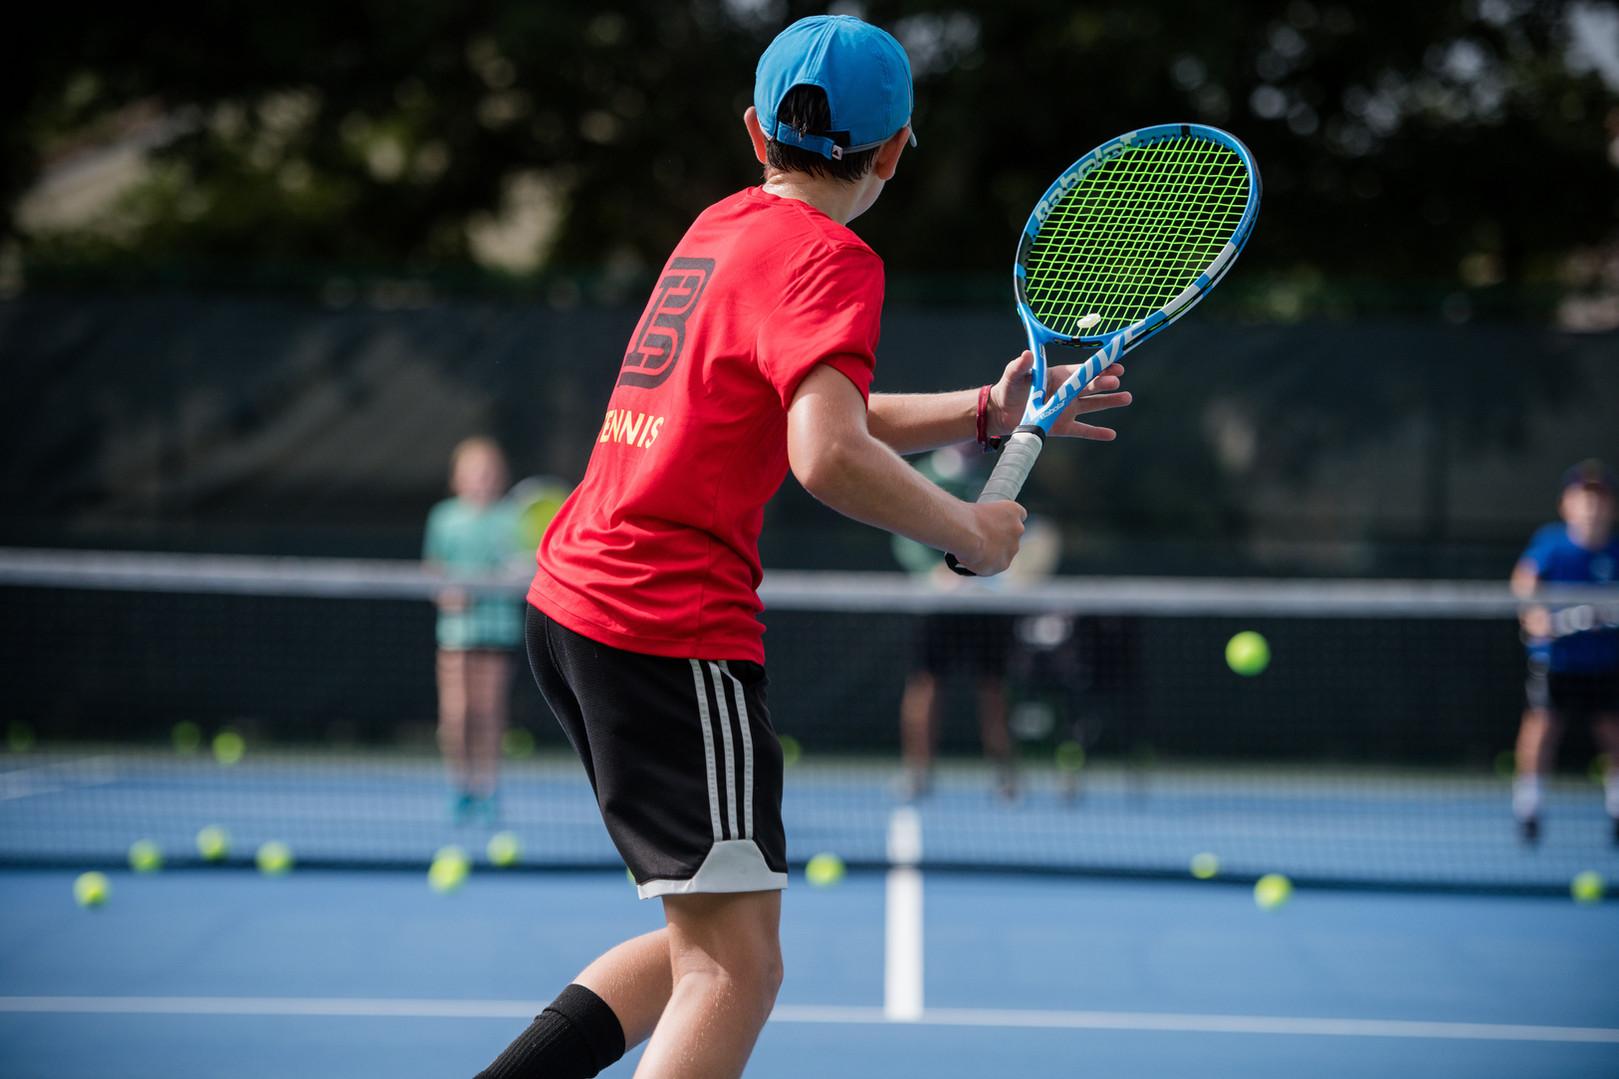 Tennis_Youth_20200724_0811.jpg